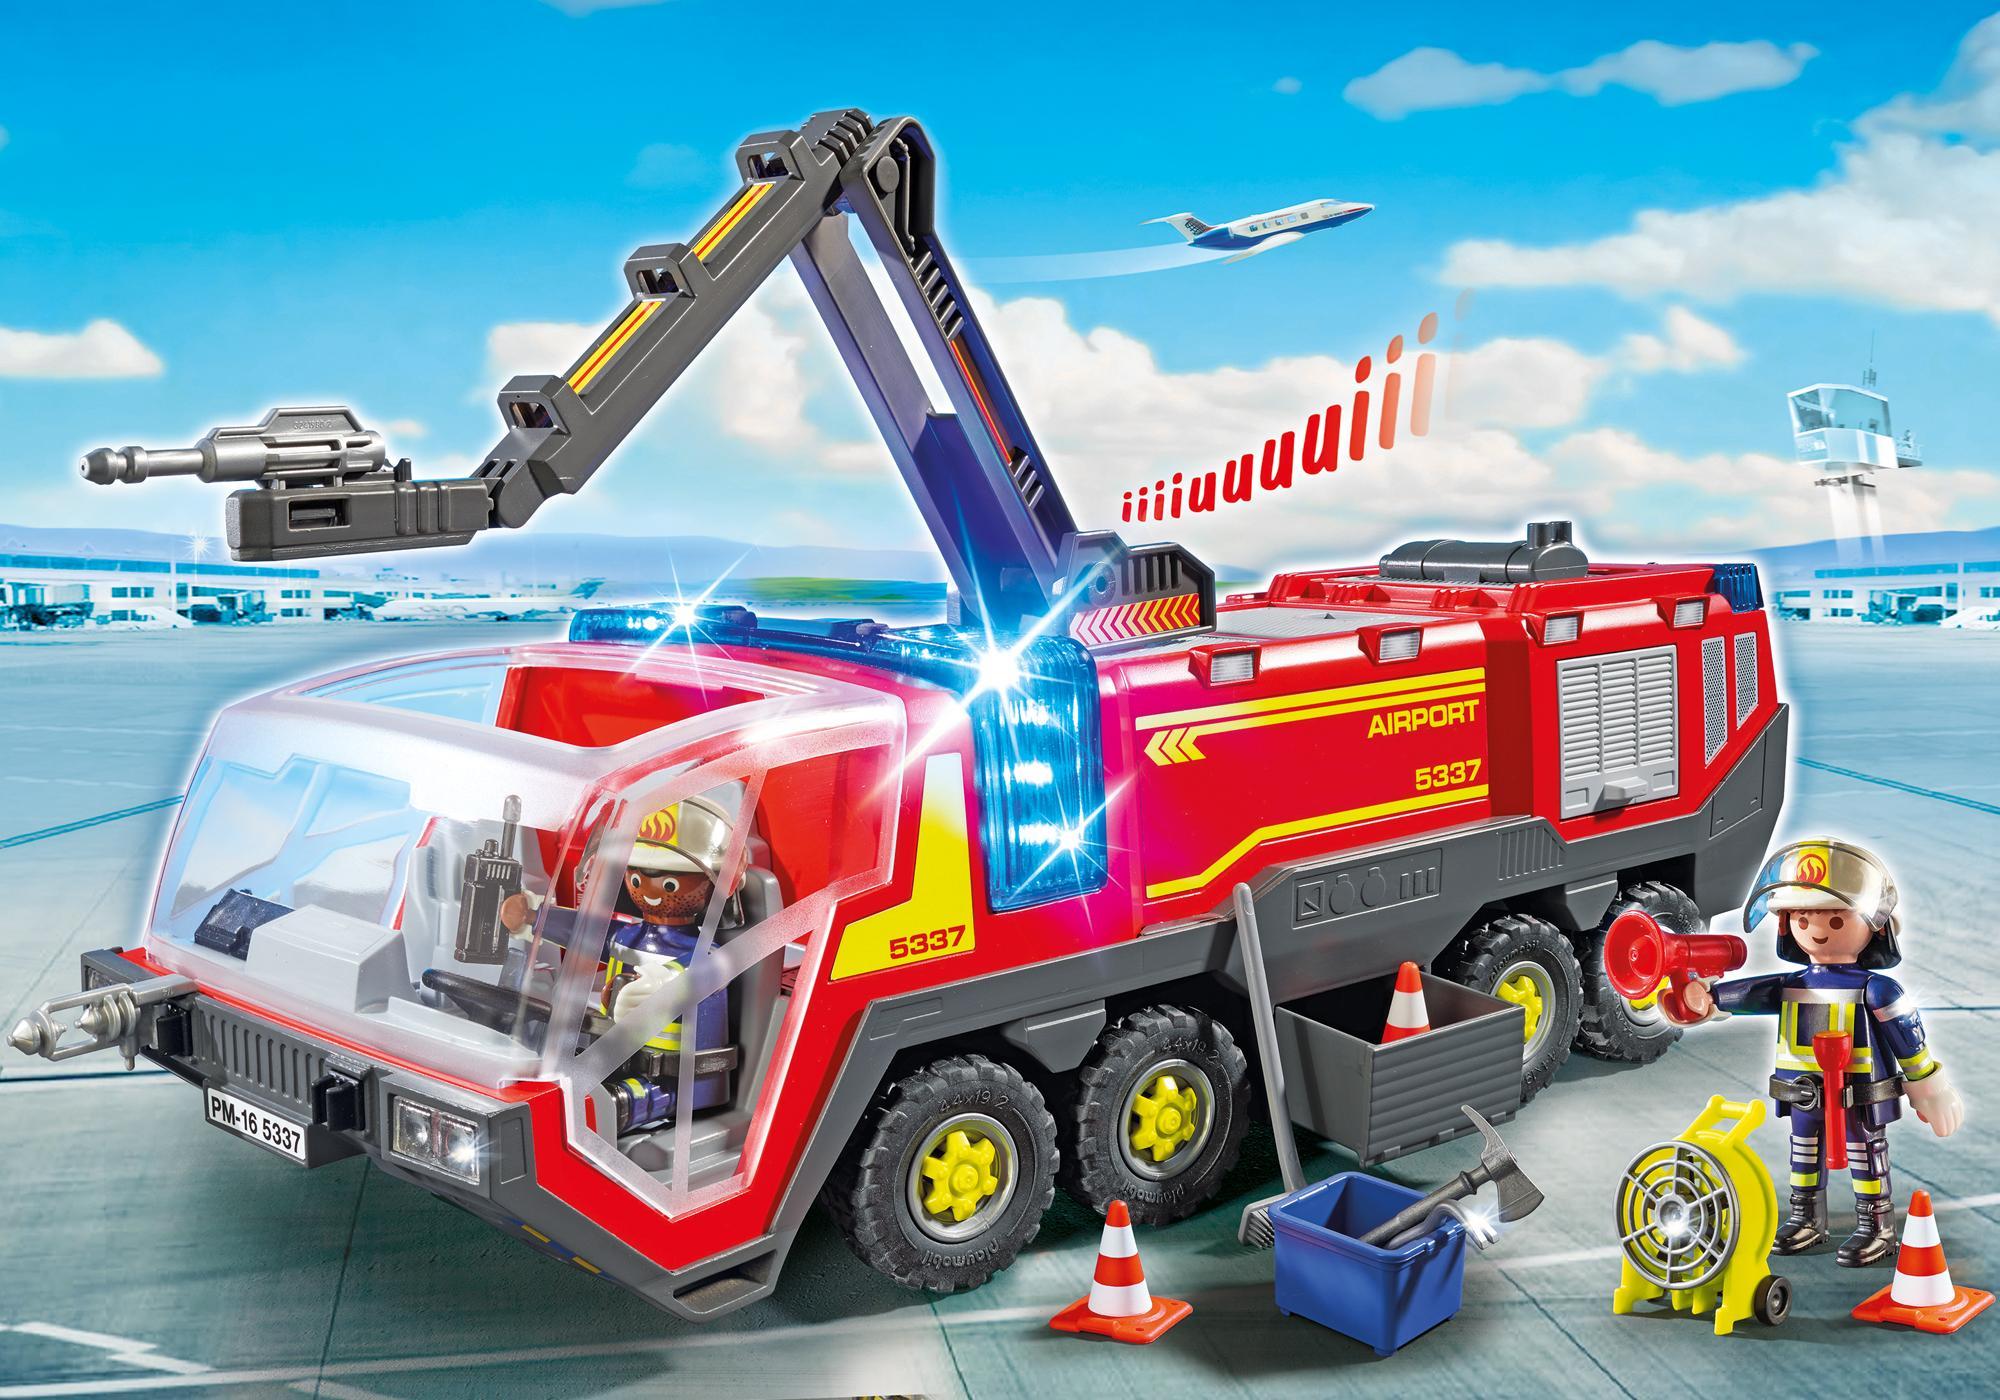 http://media.playmobil.com/i/playmobil/5337_product_detail/Luchthavenbrandweer met licht en geluid